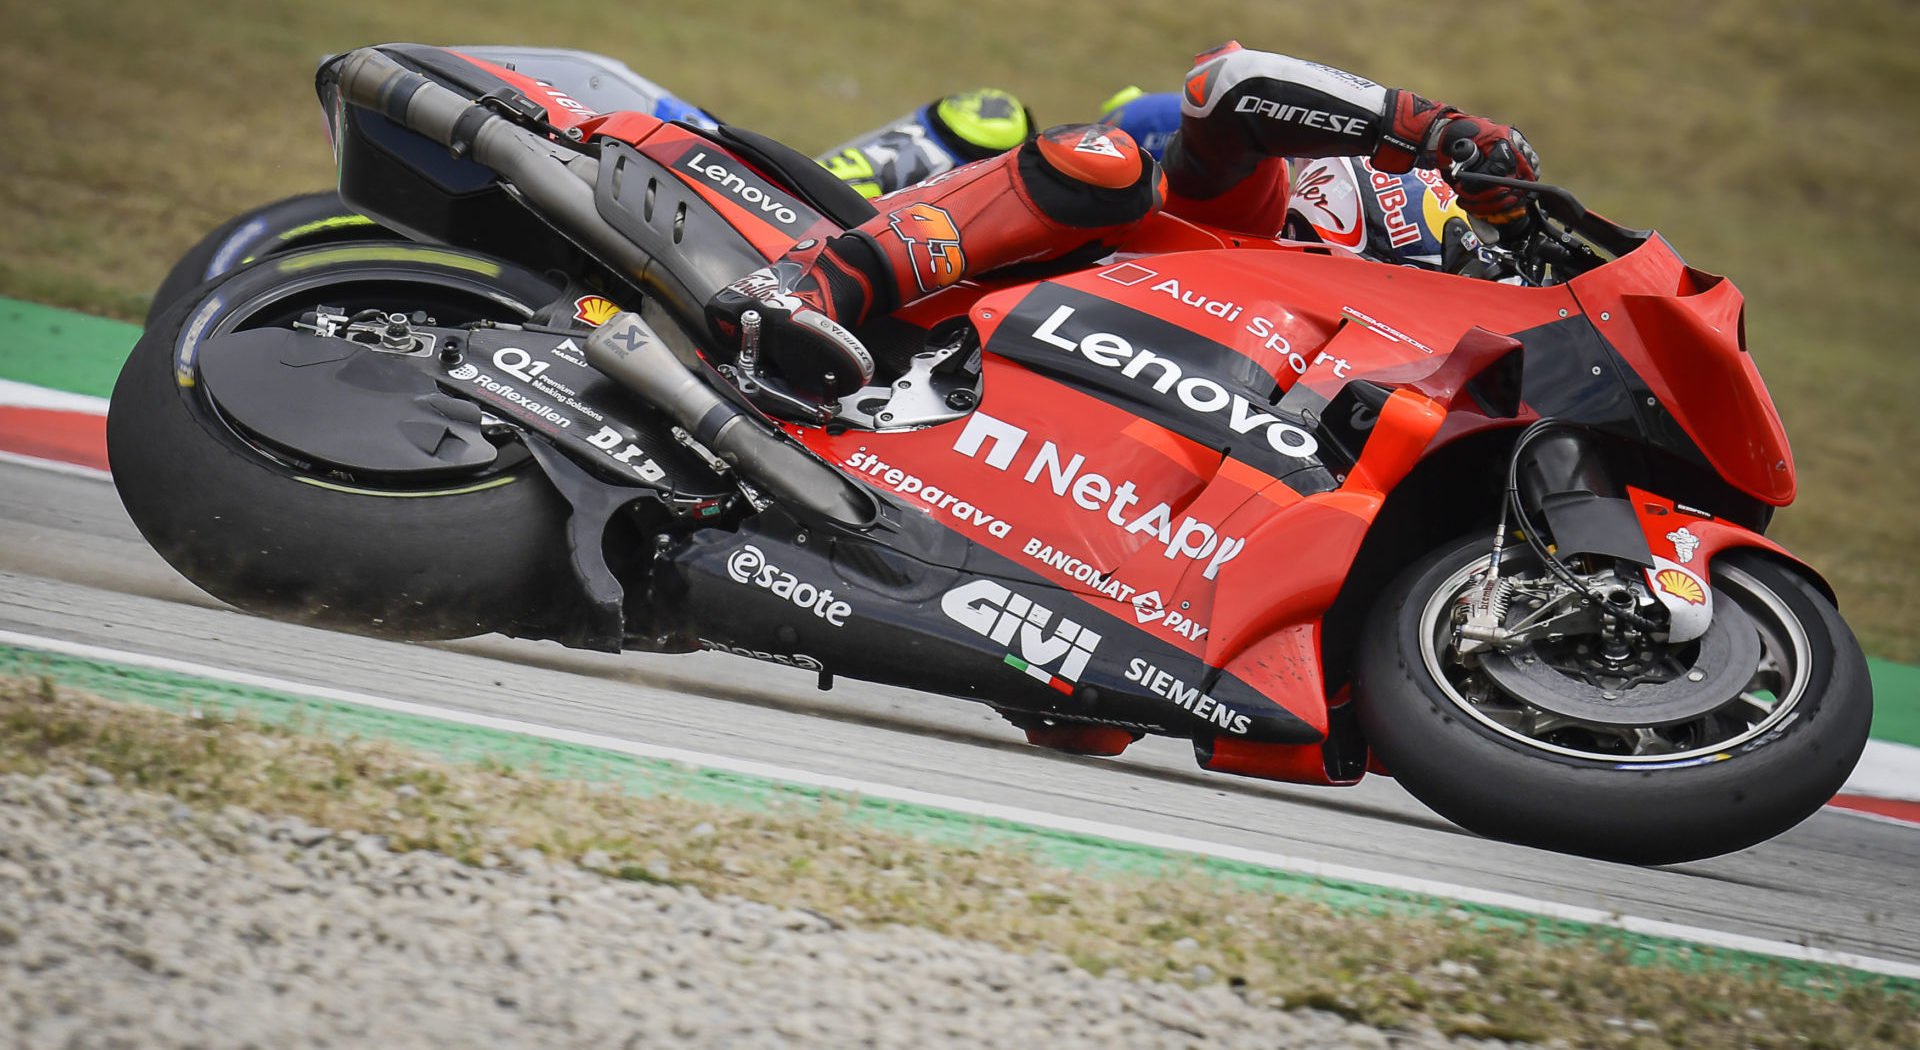 MotoGP: Miller Quickest In FP2 At MotorLand Aragon (Updated) - RoadracingWorld.com